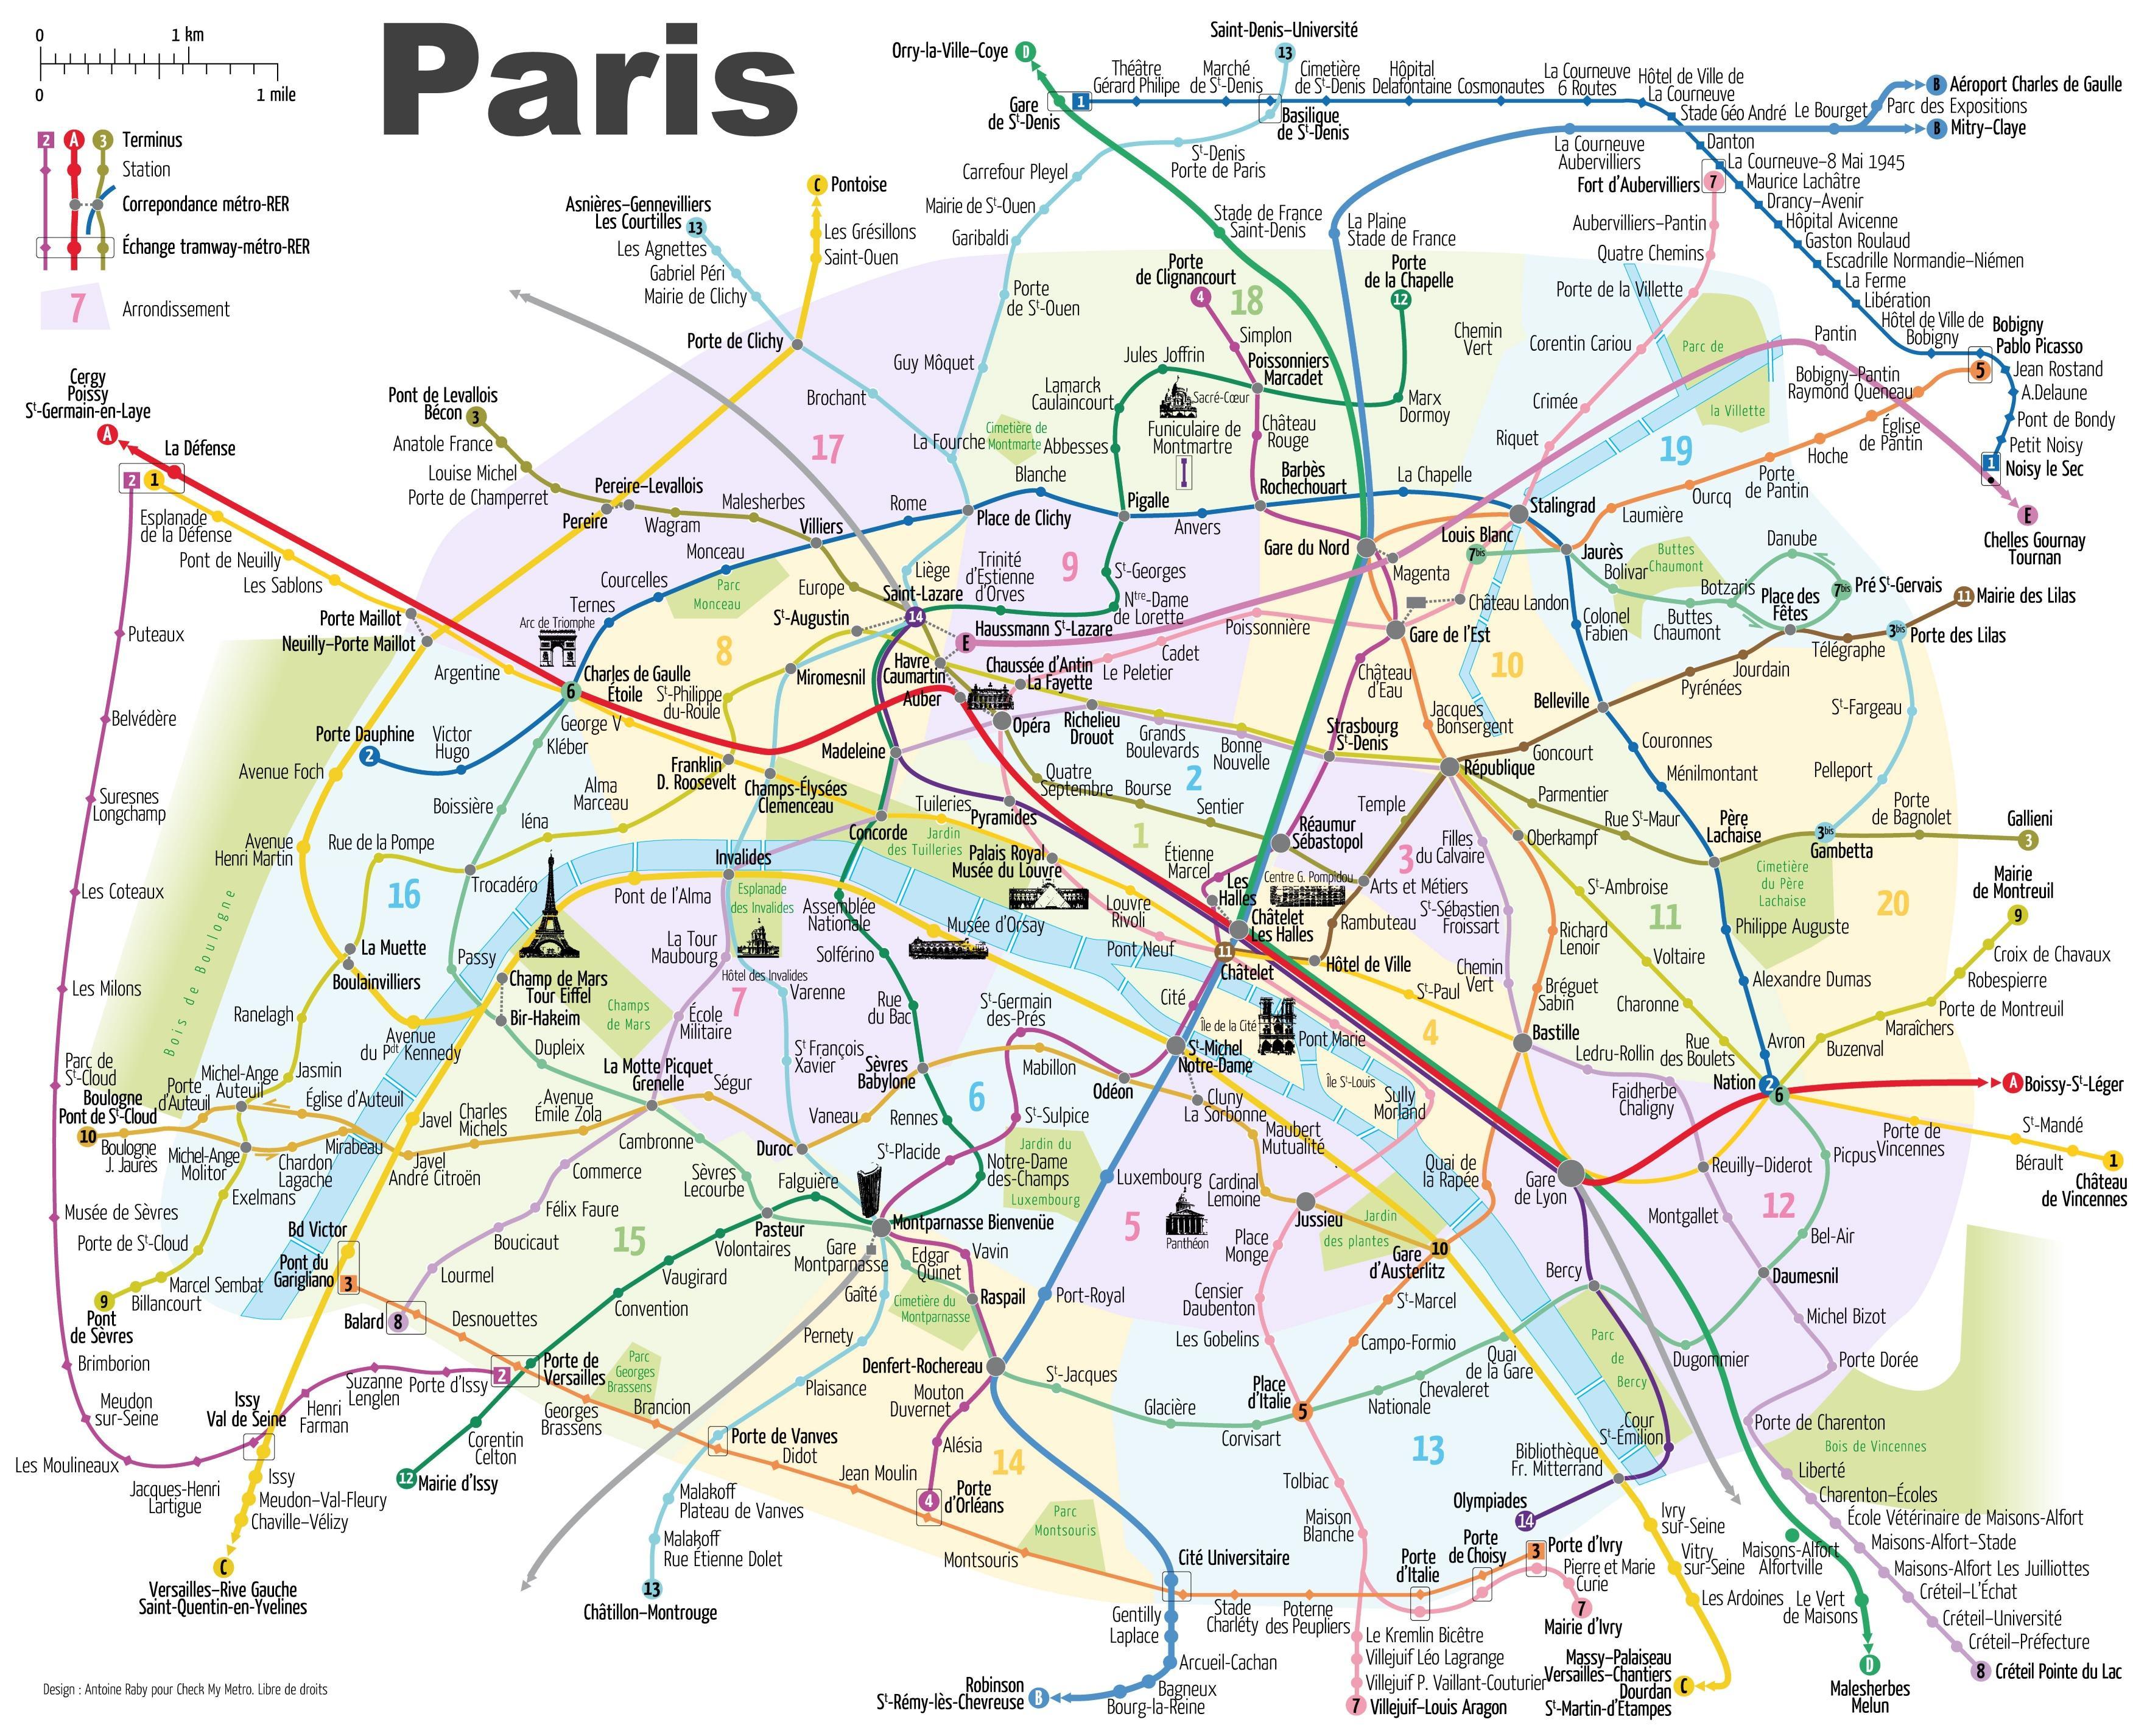 Paris Metro Kort Med Sevaerdigheder Paris Tube Map Med